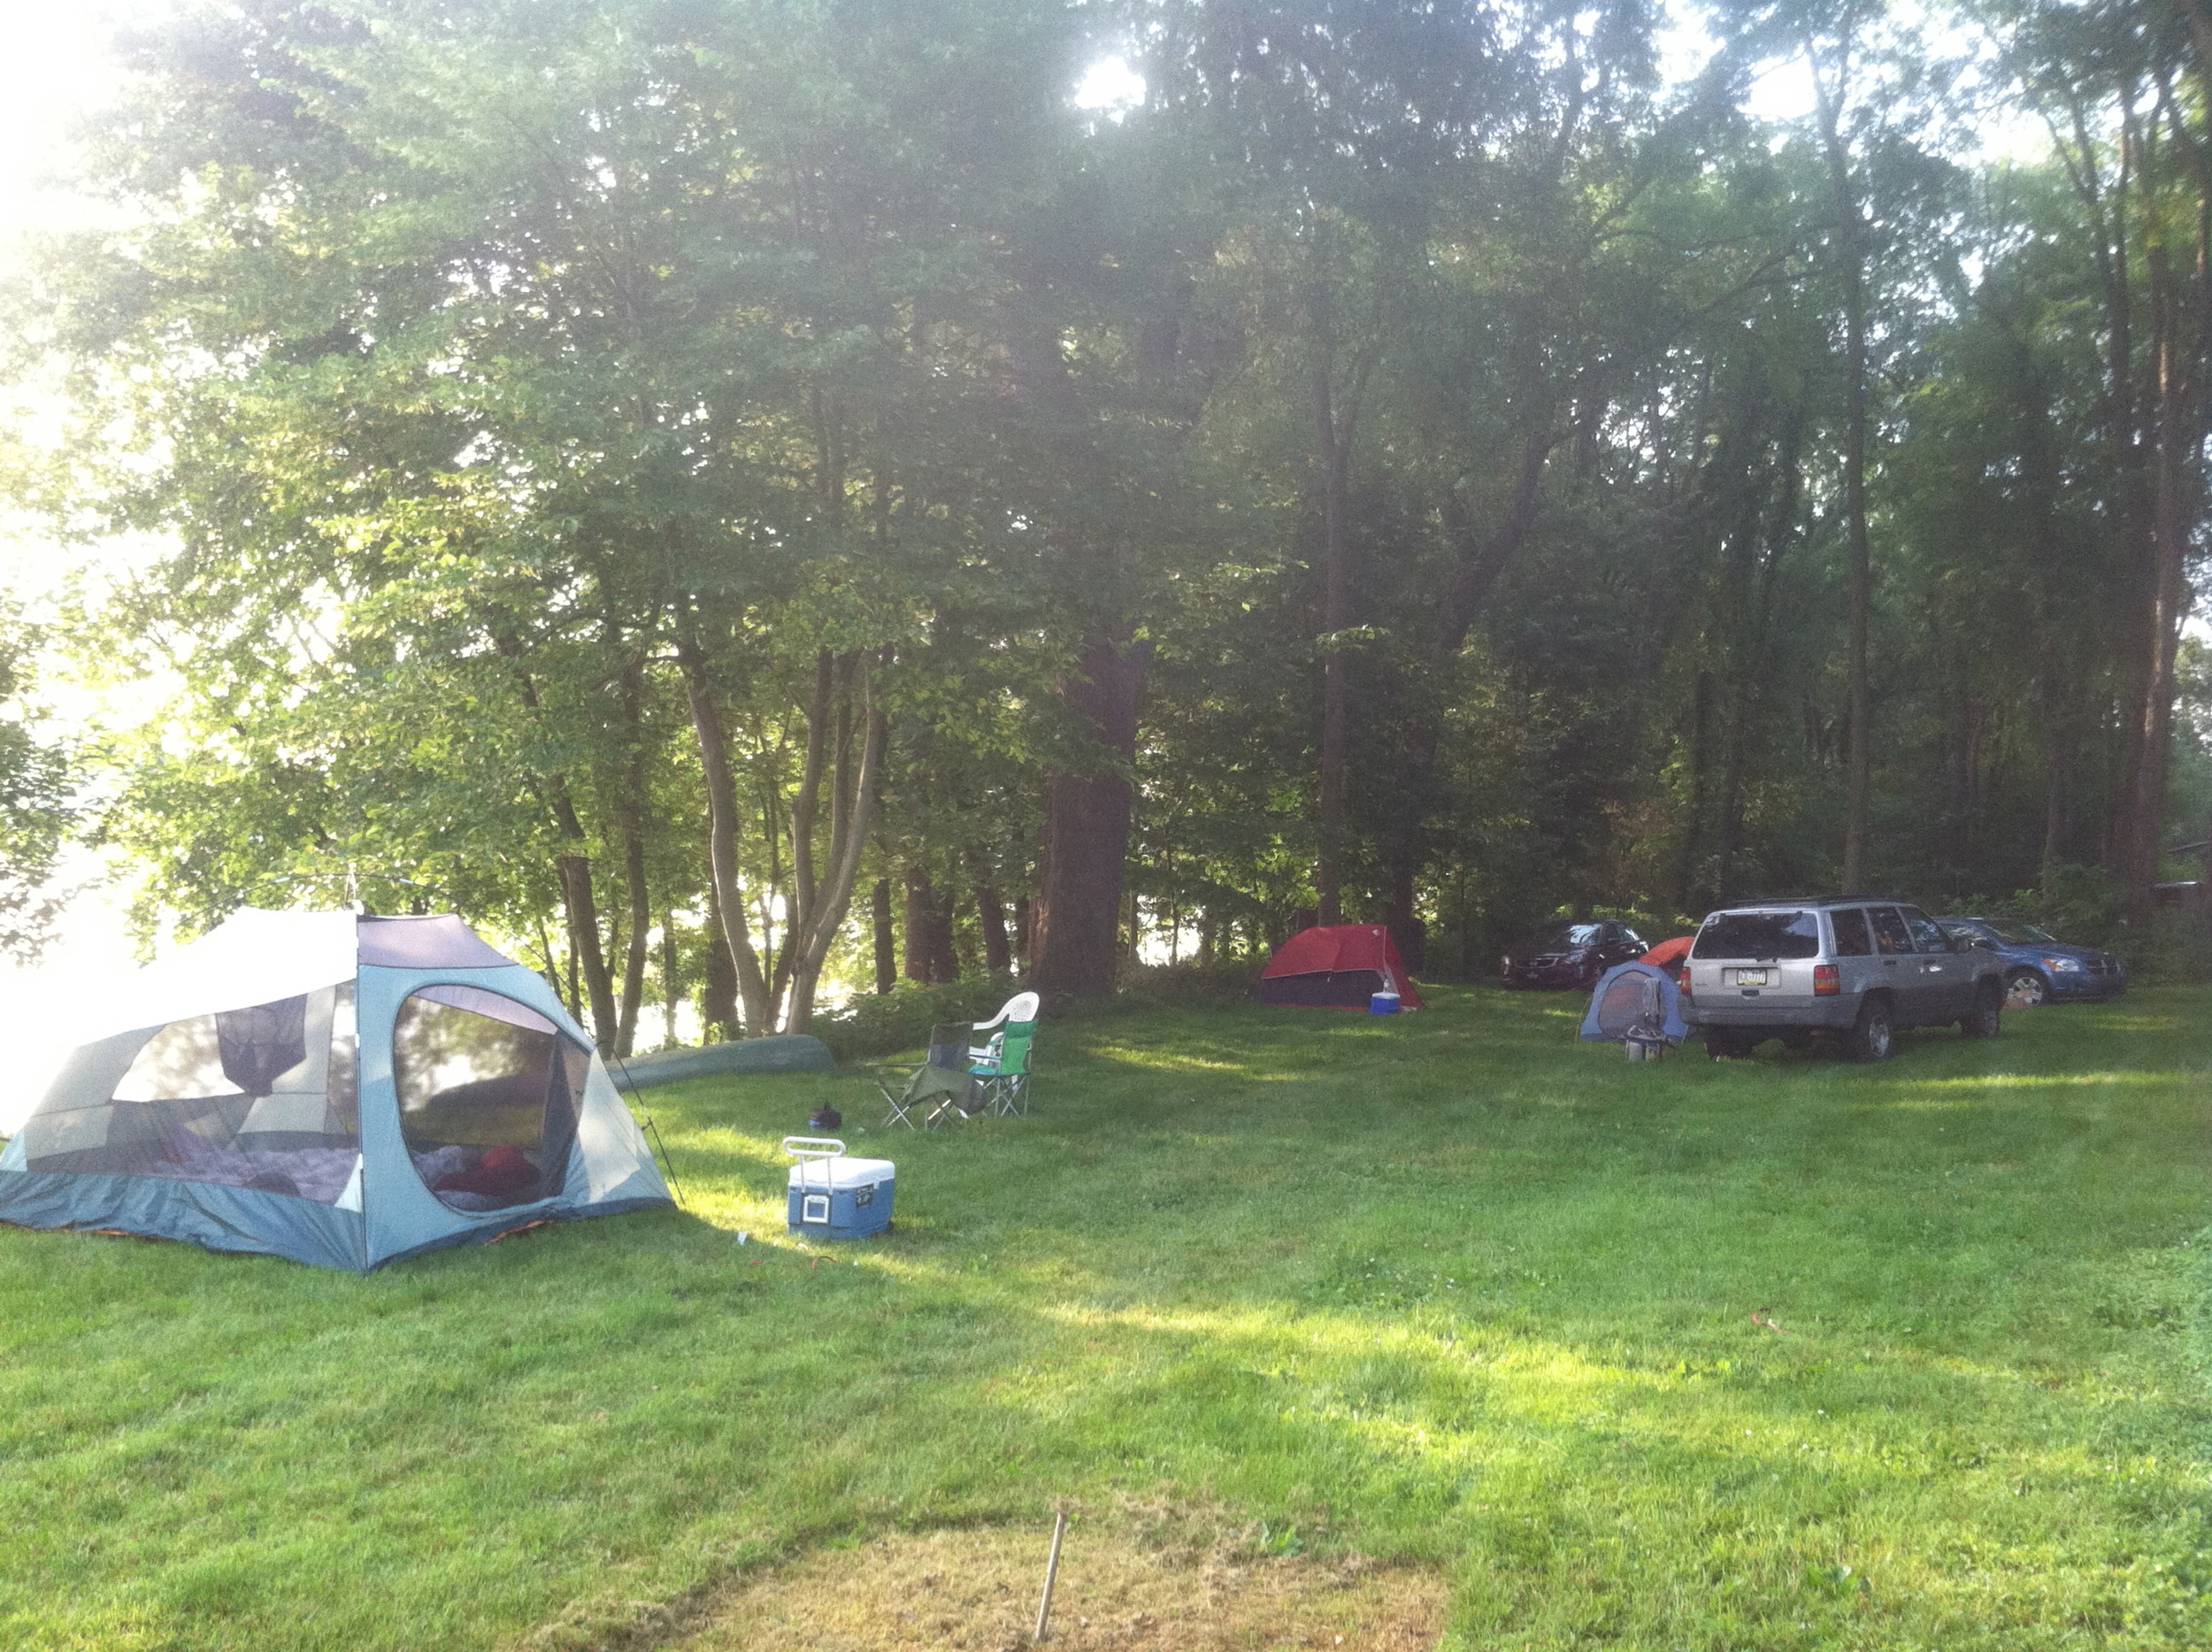 2013 - Camping in Riverside - Fri.